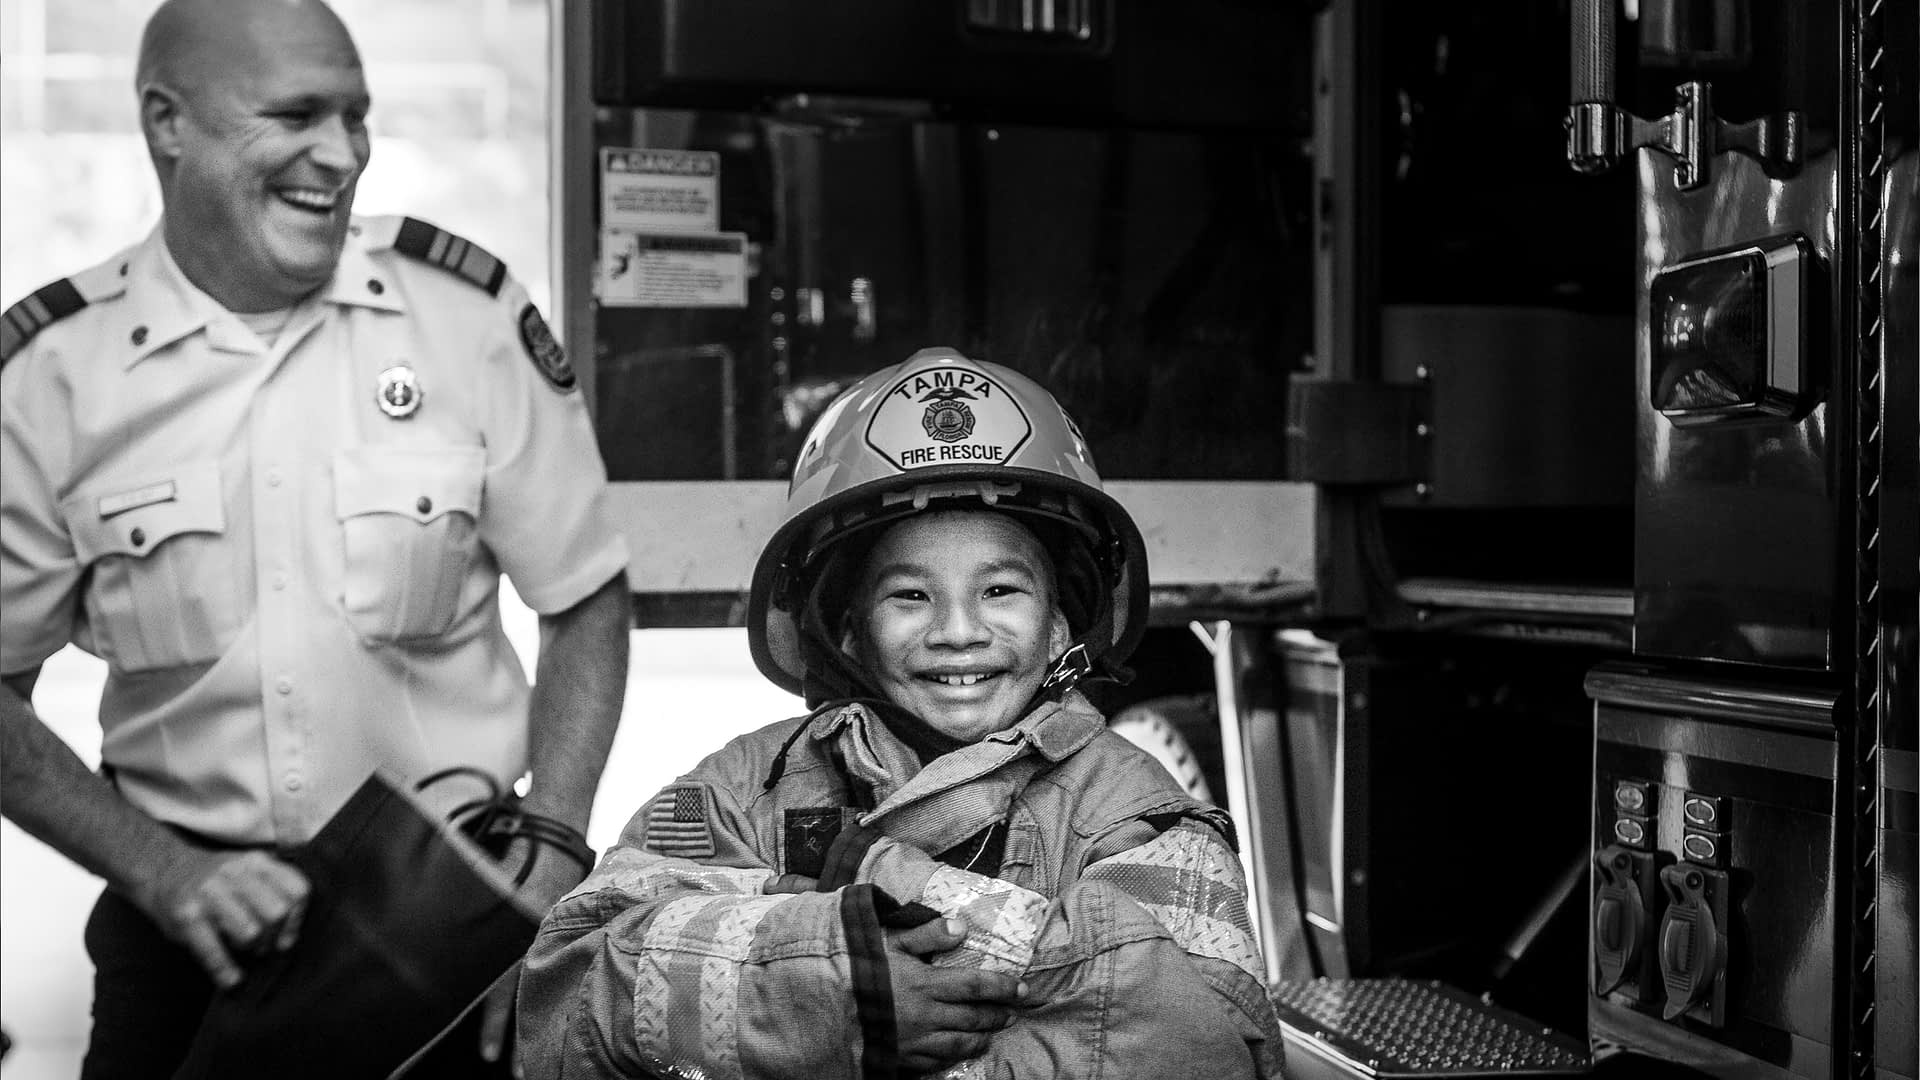 Make-A-Wish Boy In Fireman's Suit